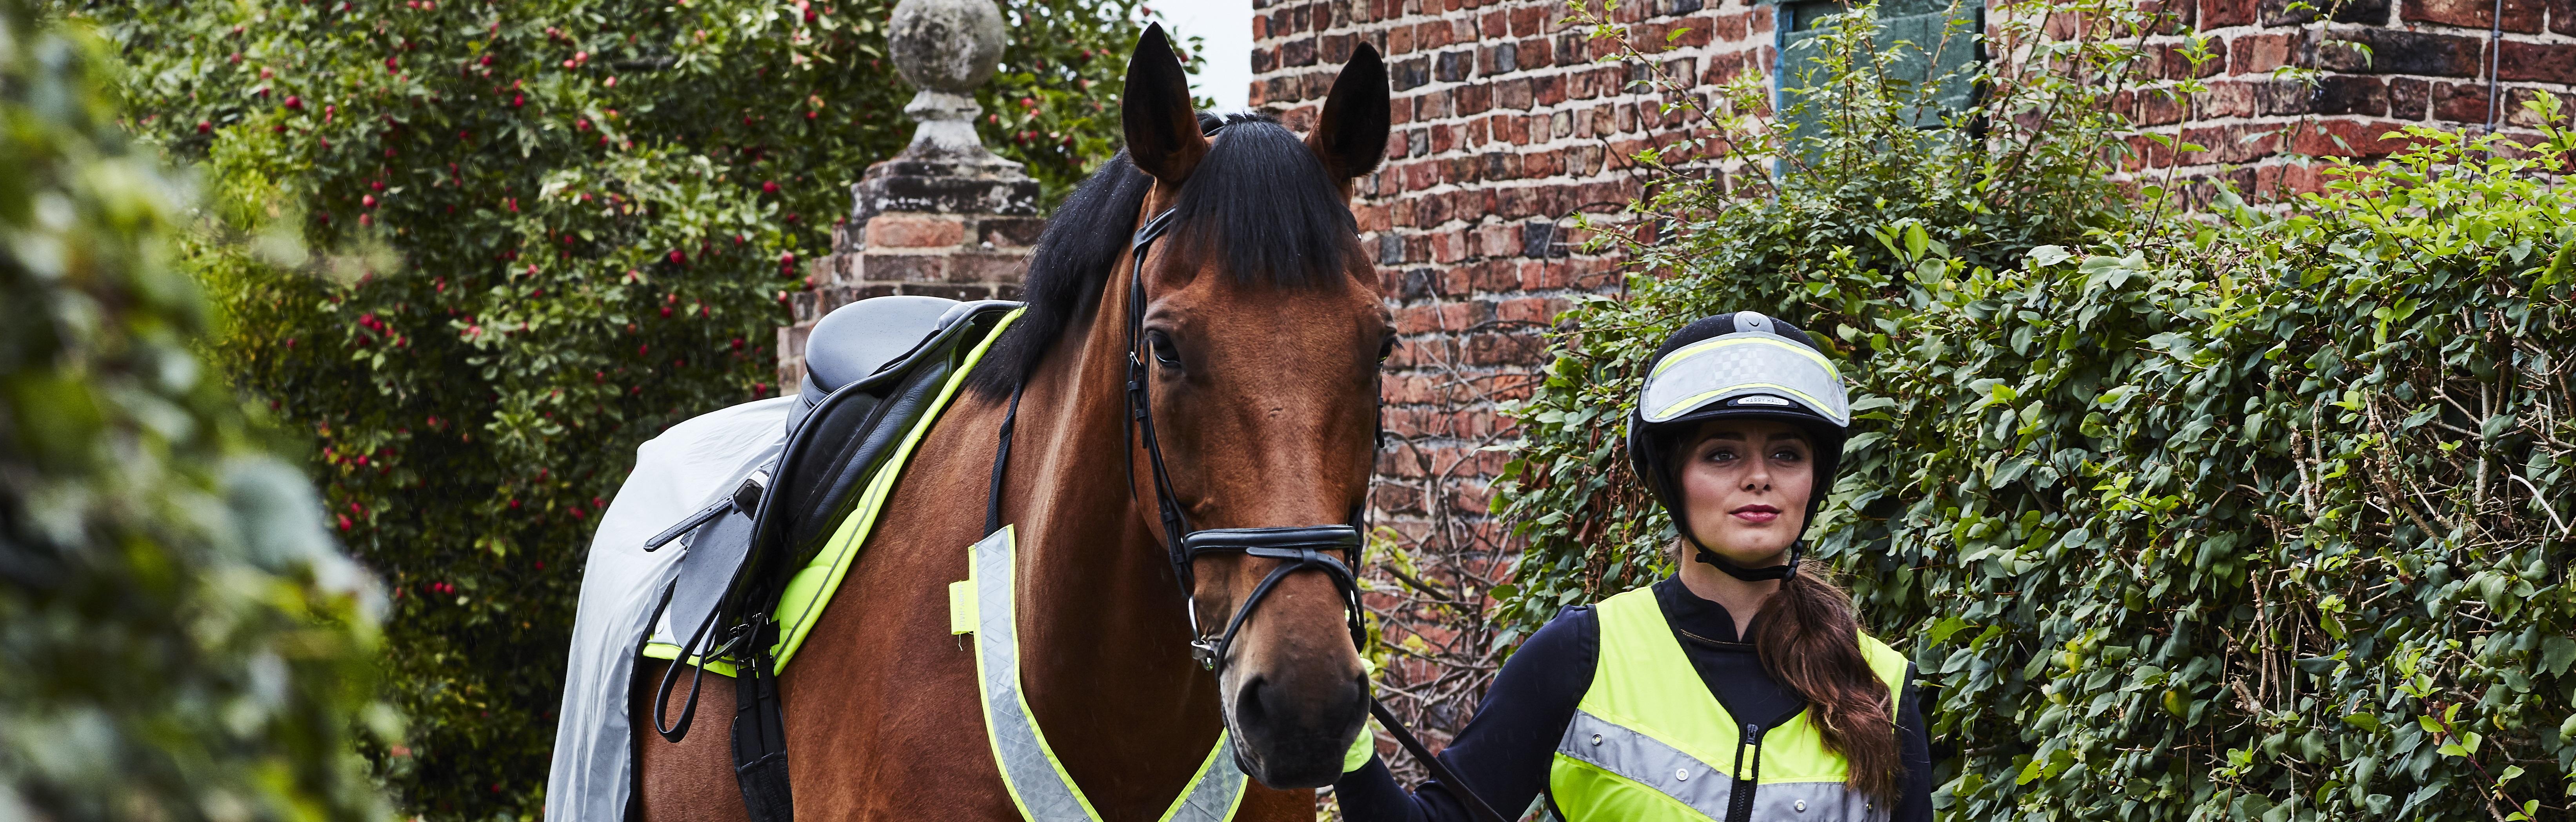 Public Liability Insurance for Horses